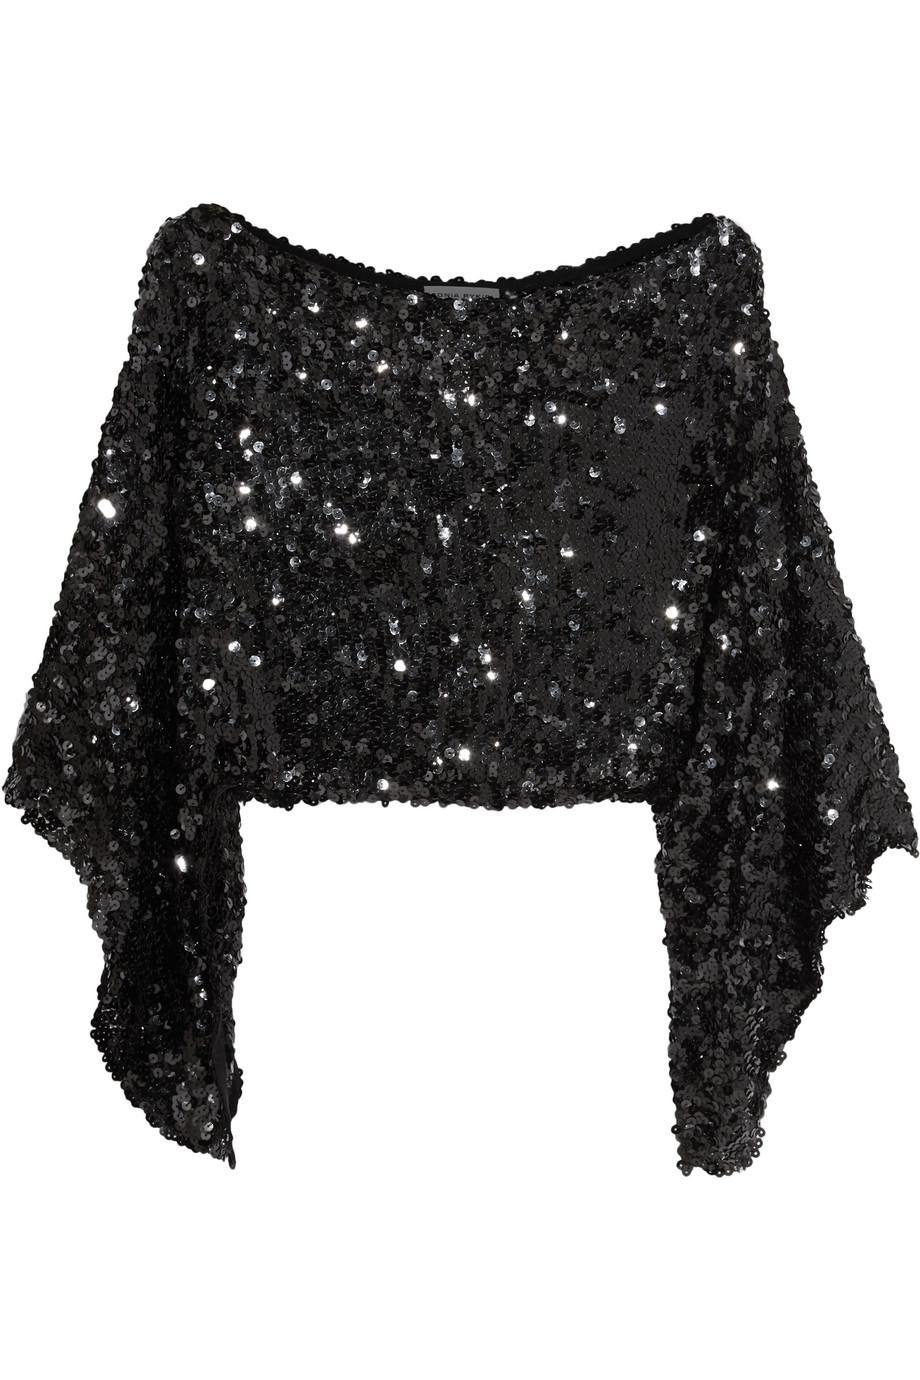 Sonia Rykiel Cropped Asymmetric Sequined Stretch-Knit Top, Black, Women's, Size: One size